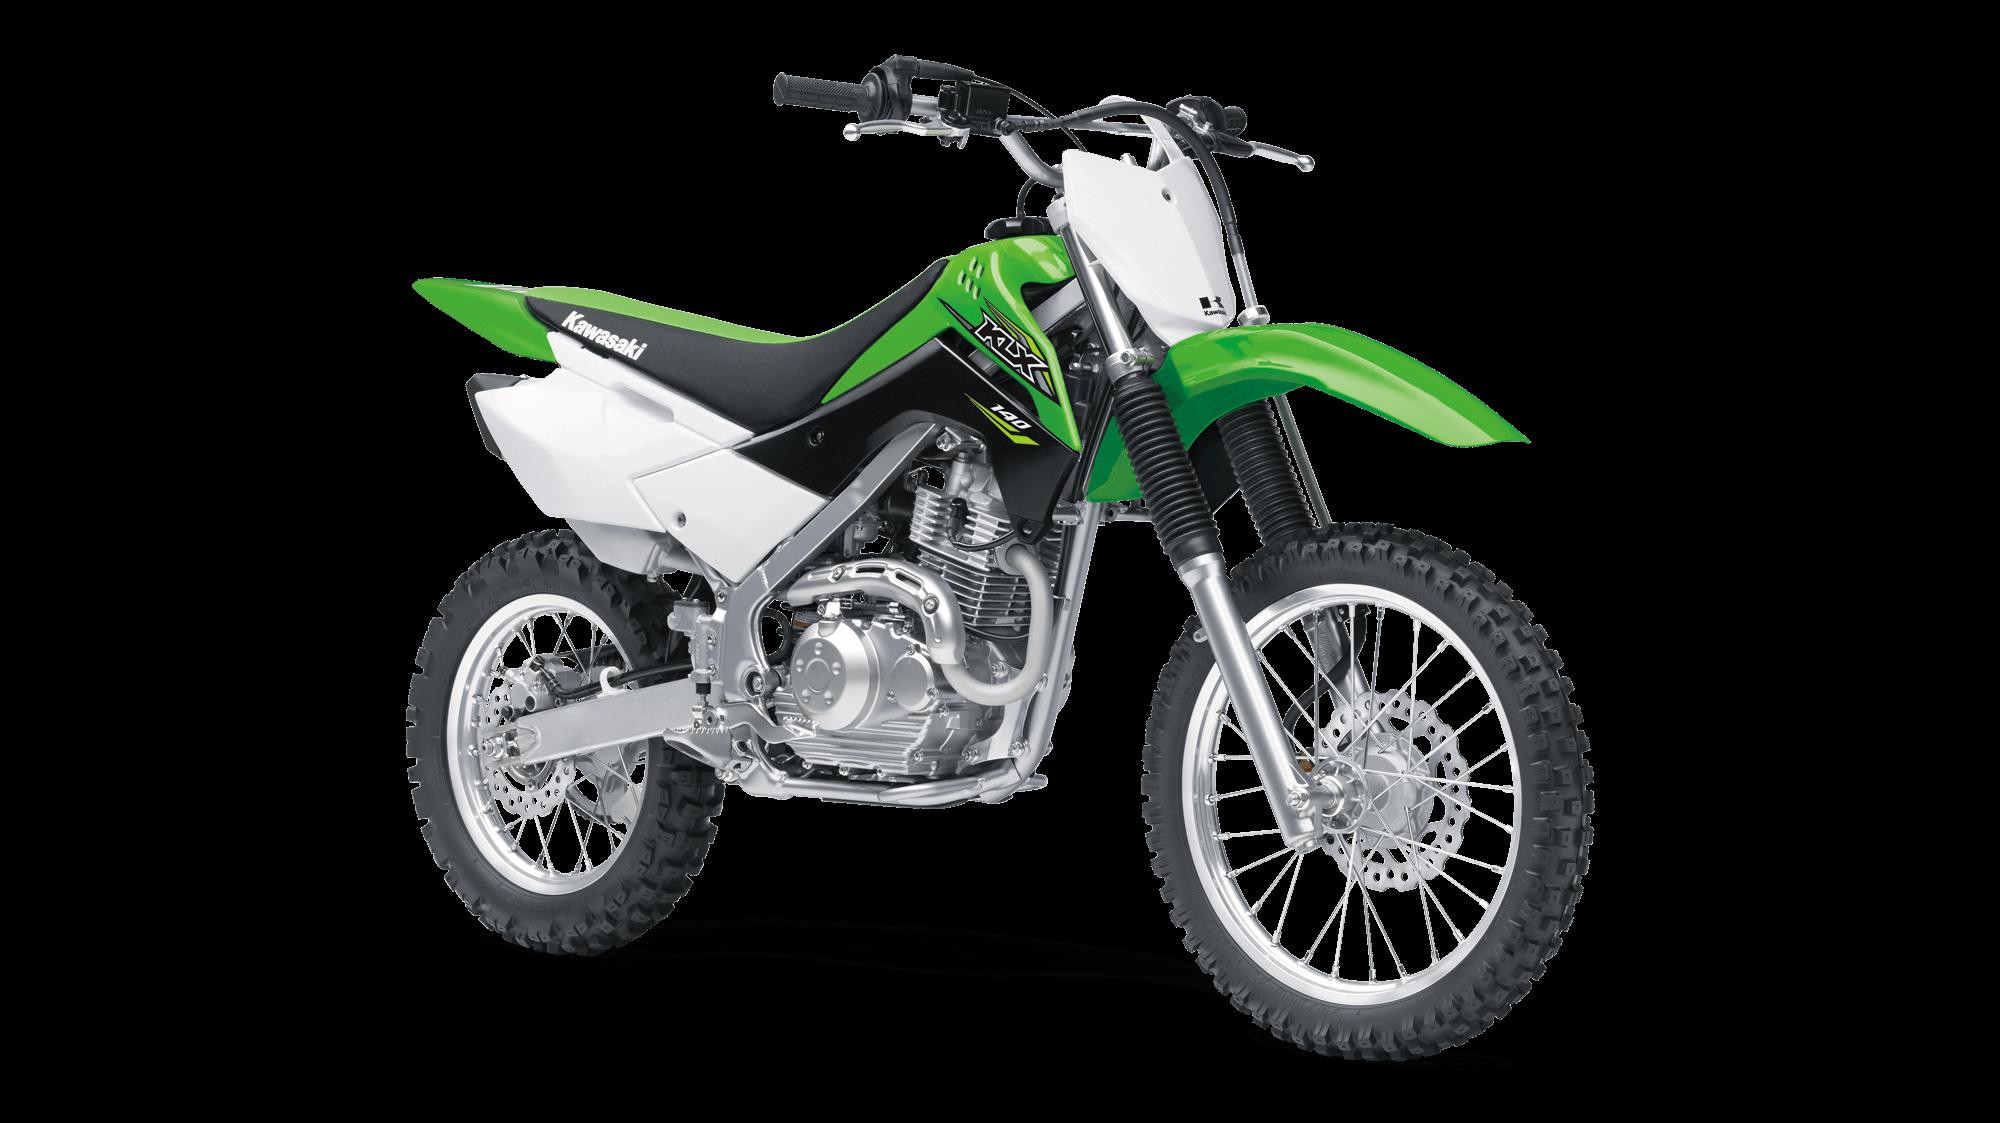 Klx 140 Klr Klx Motorcycle By Kawasaki